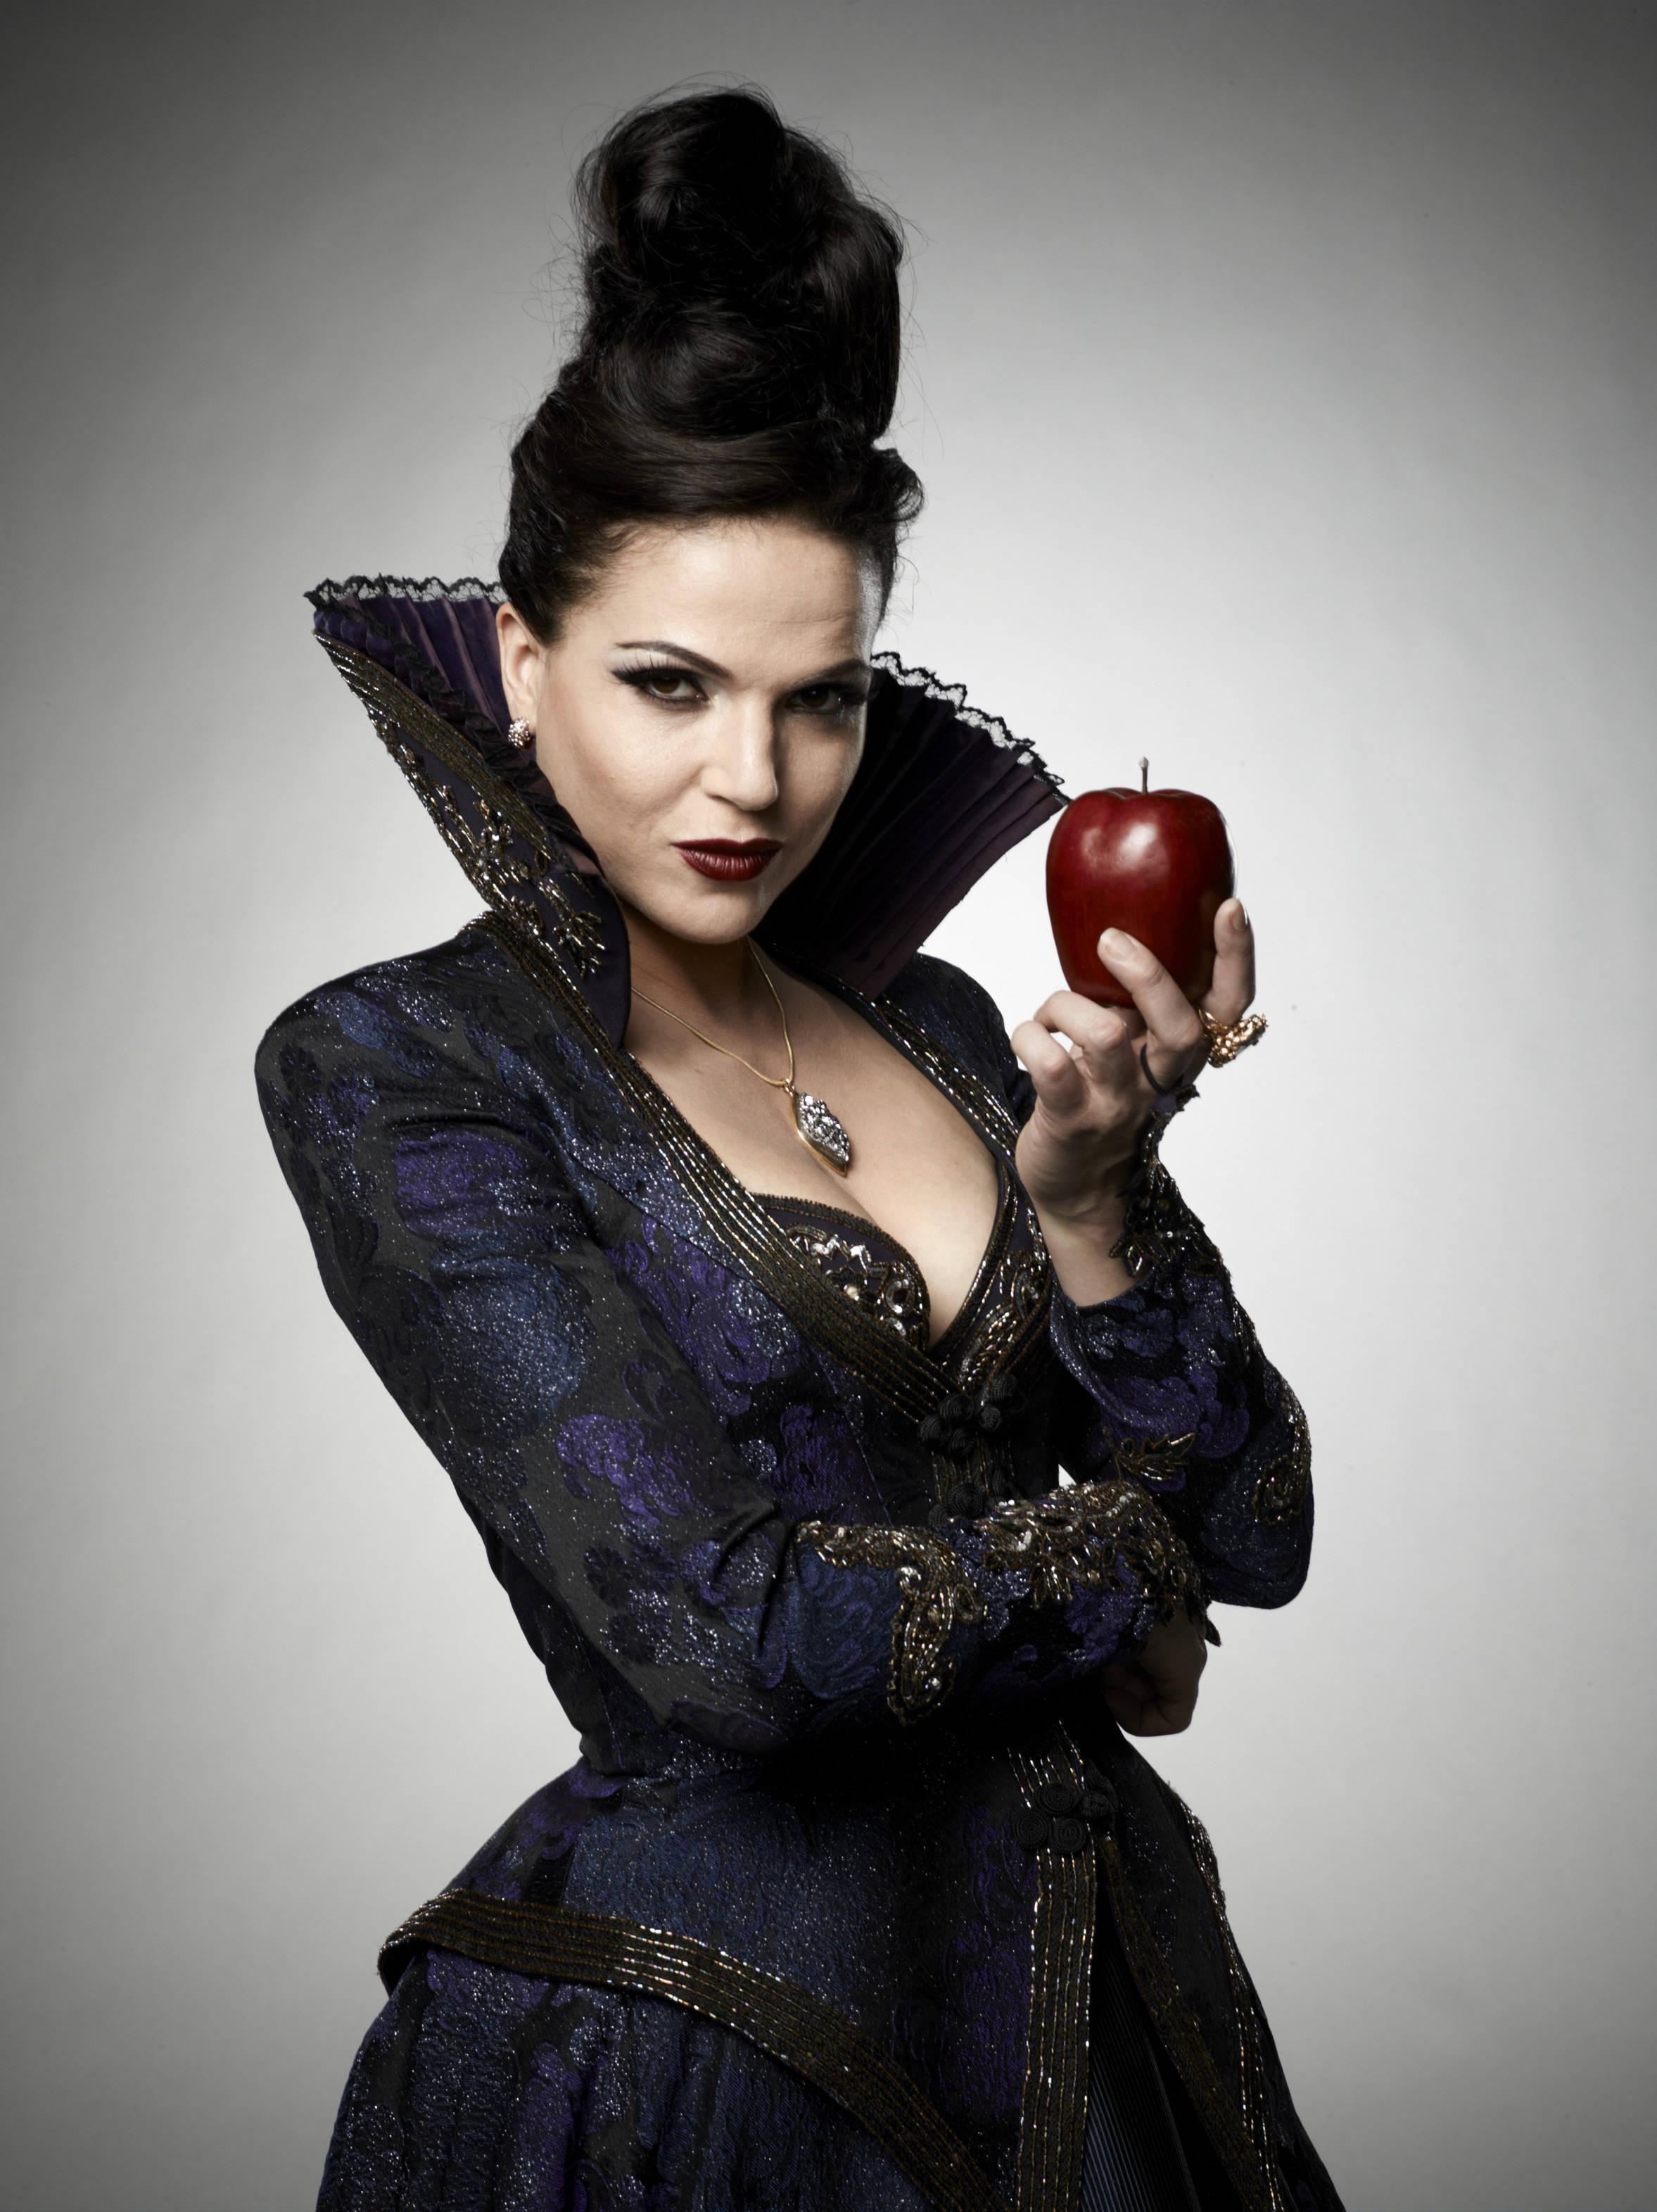 Regina - The Evil Queen/Regina Mills Photo (35300016) - Fanpop